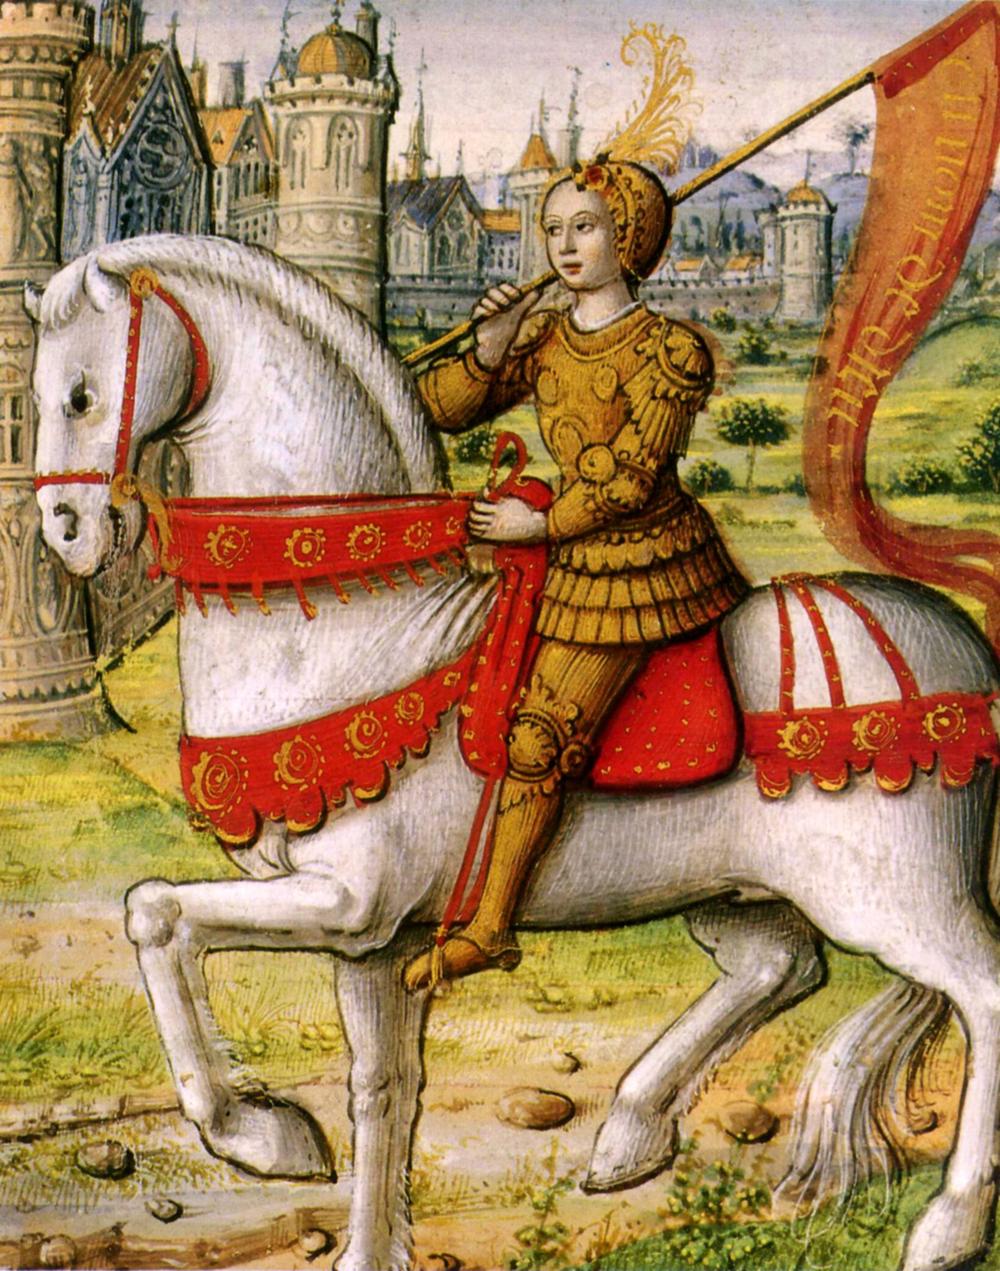 Joan_of_Arc_on_horseback.png